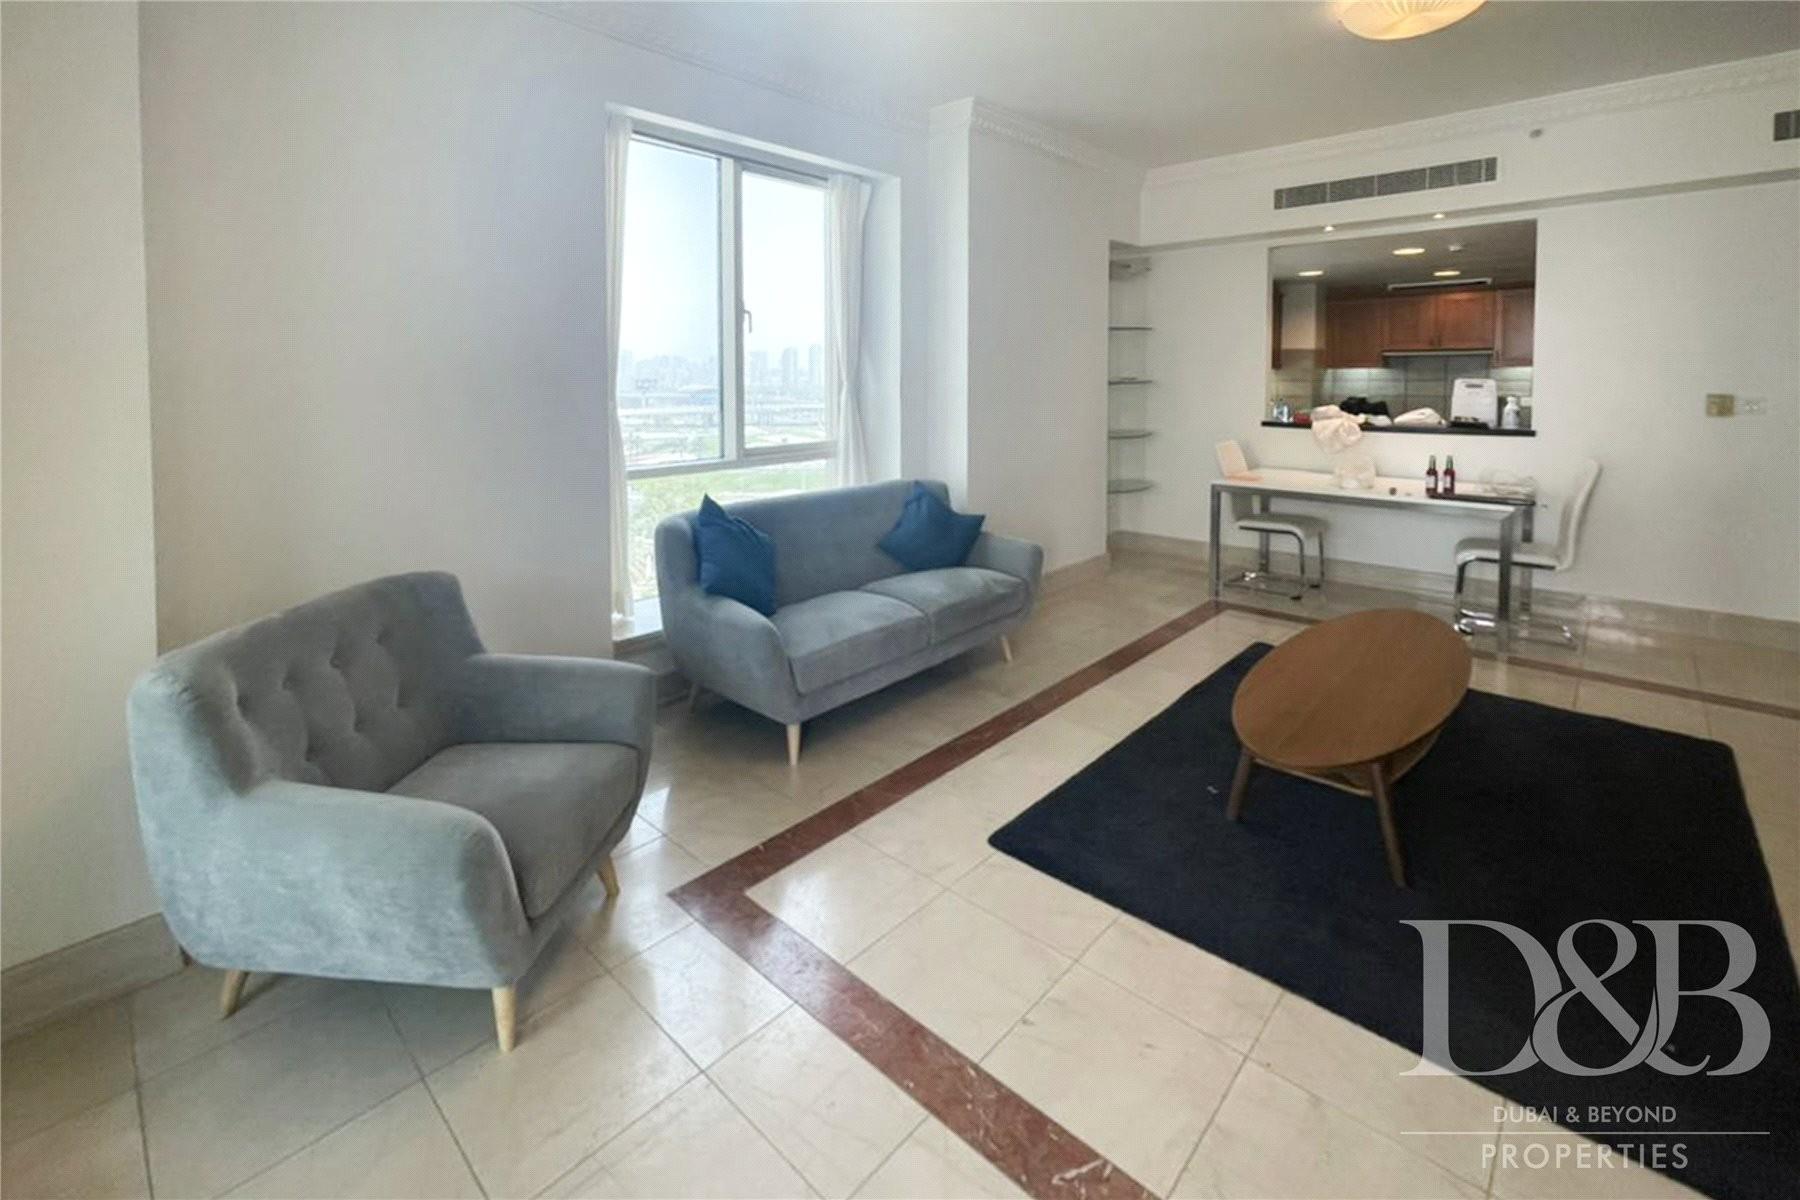 Full Marina View | Furniture Optional I Vacant